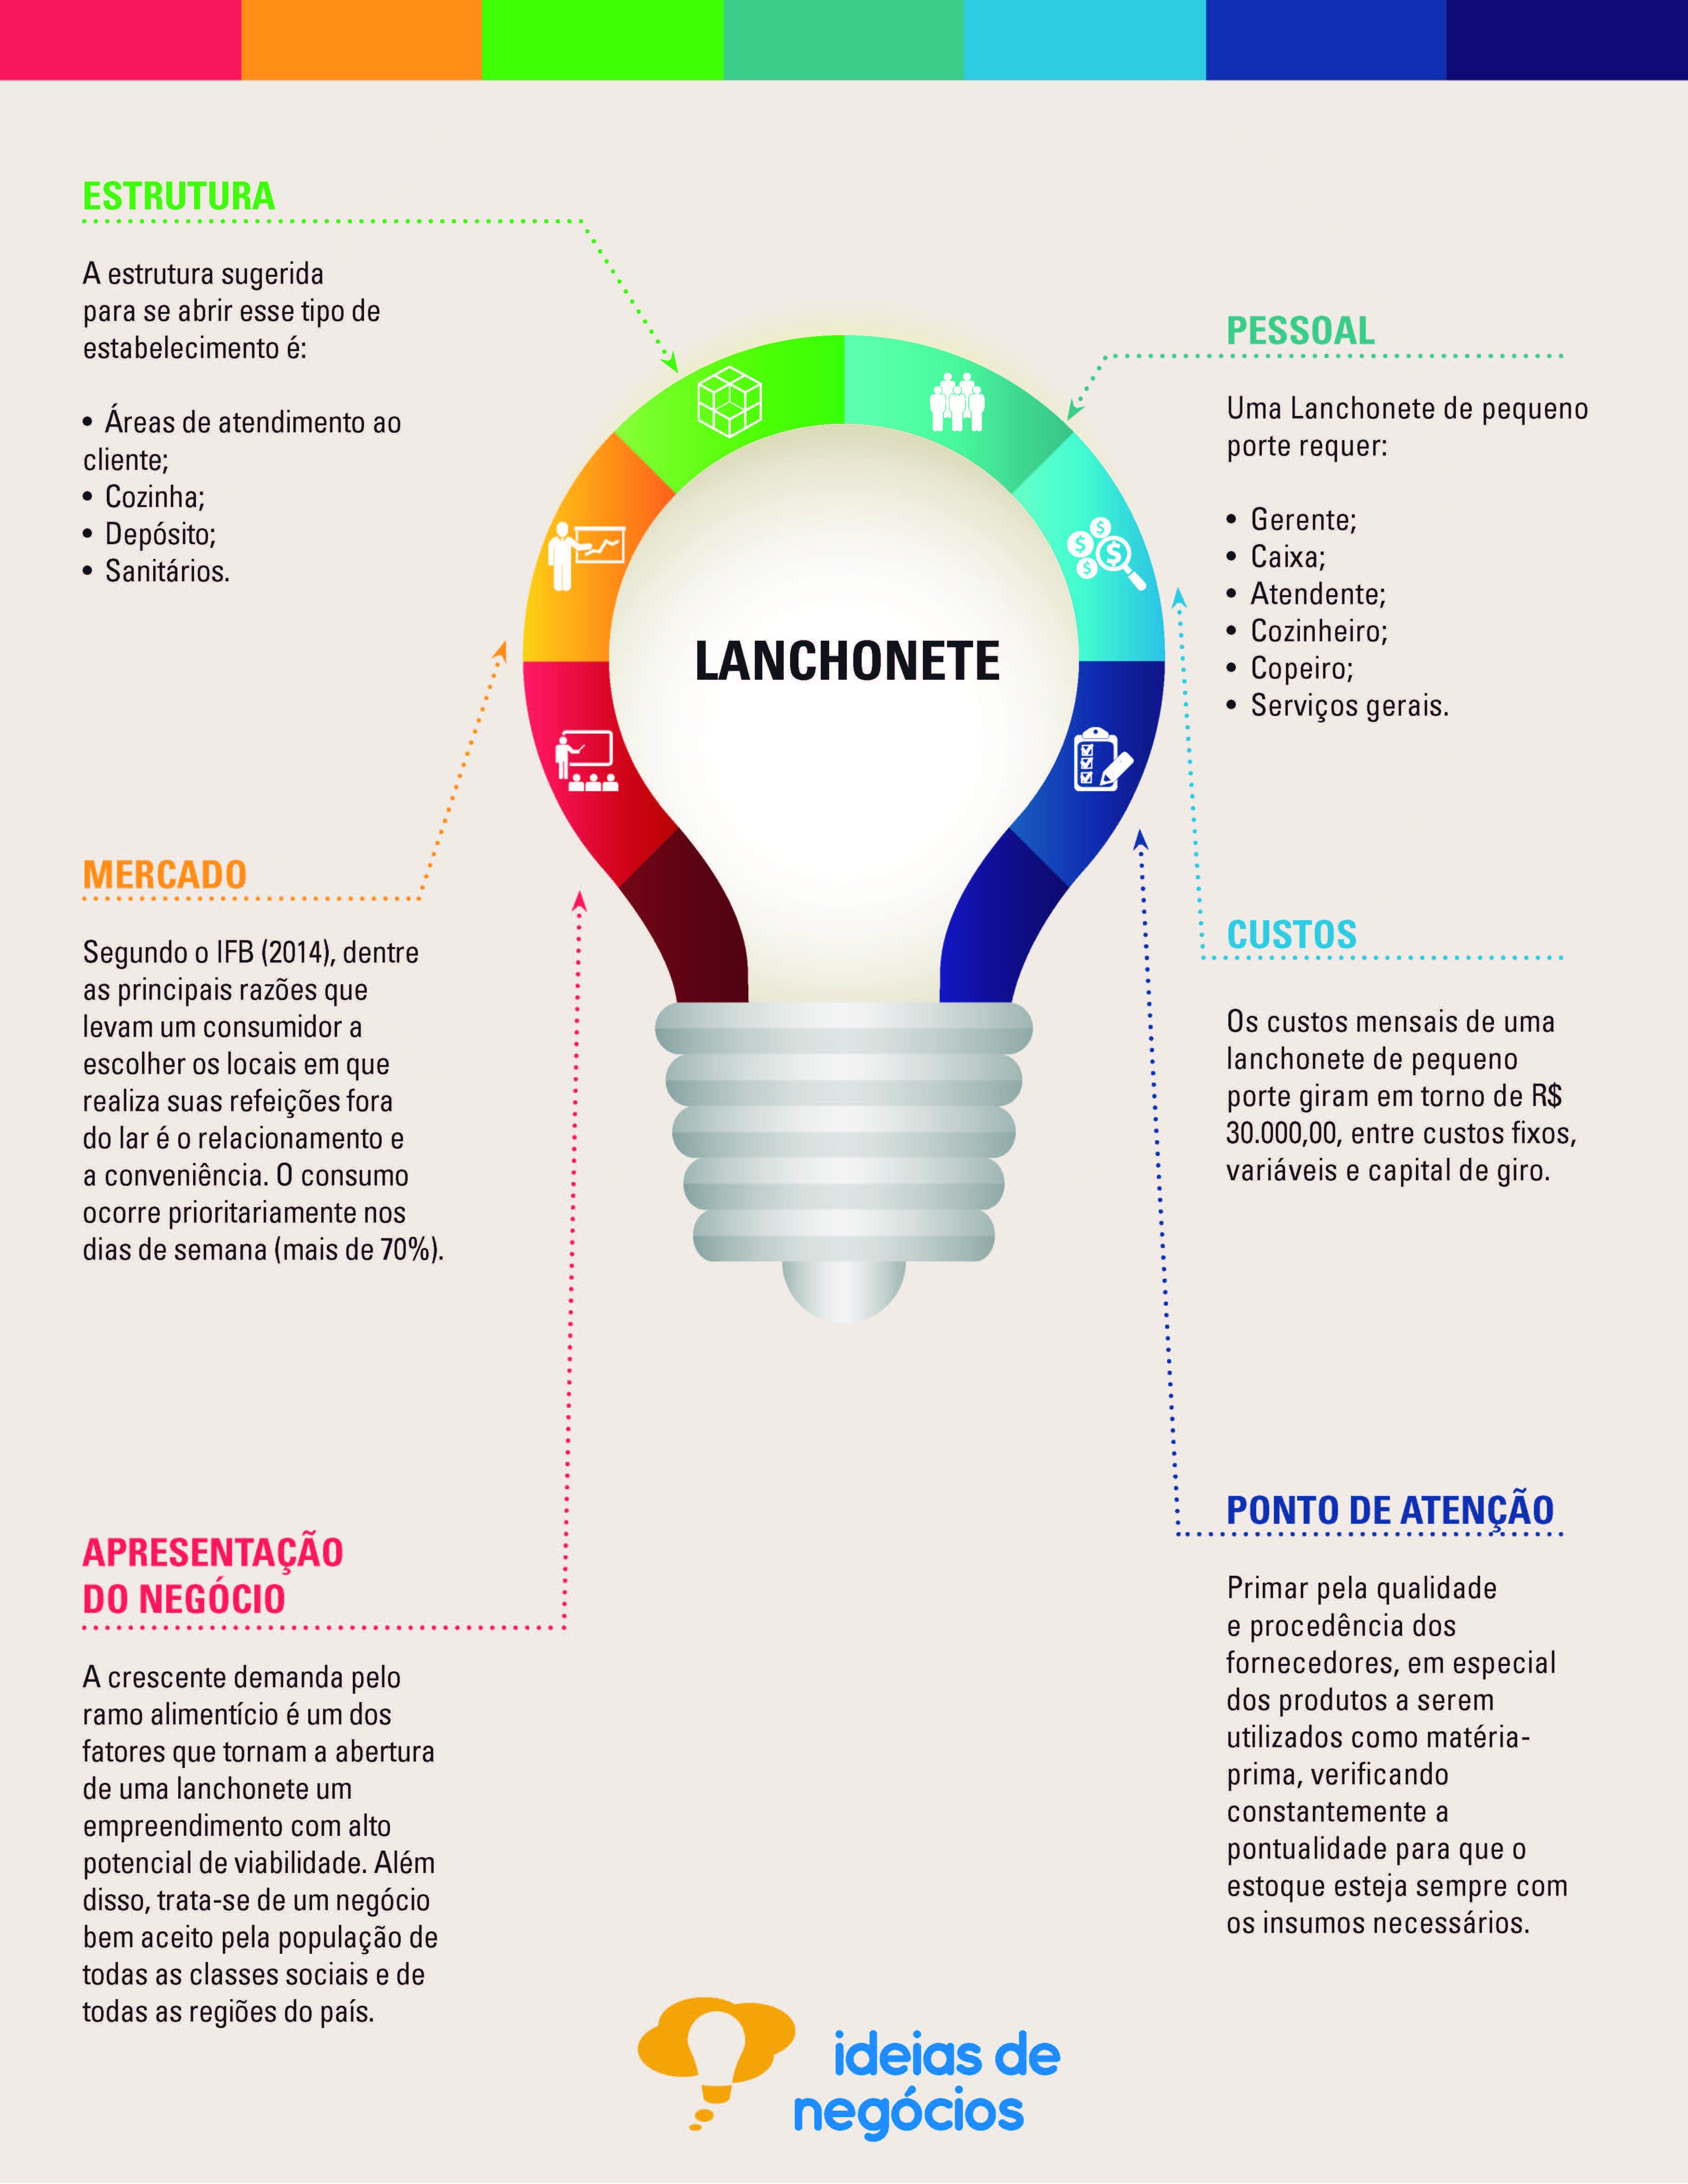 grafico idéia de negócios - Lanchonete